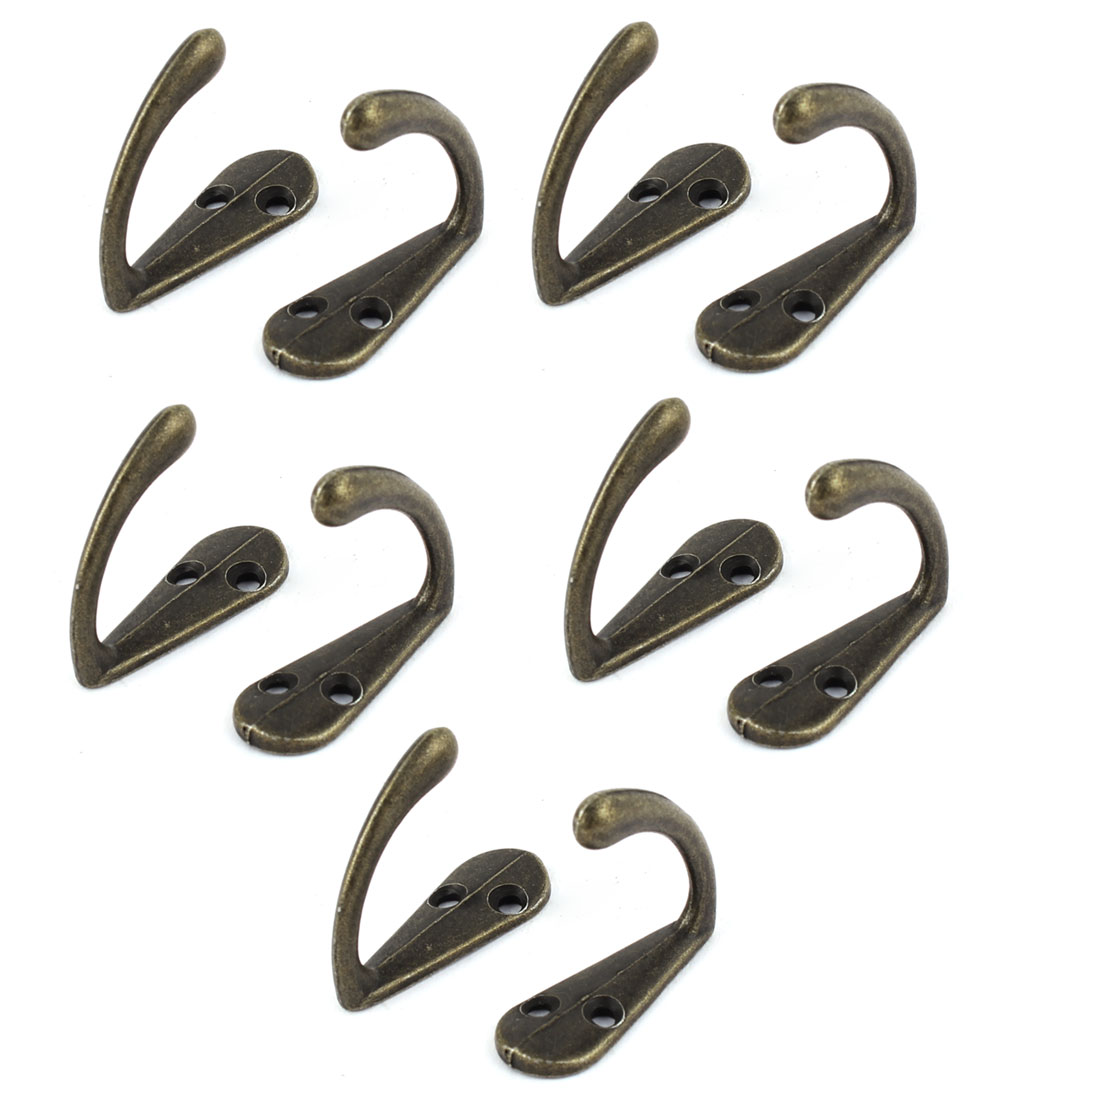 35mm Long Vintage Style Screw Fixing Clothes Hanger Hook Bronze Tone 10 PCS